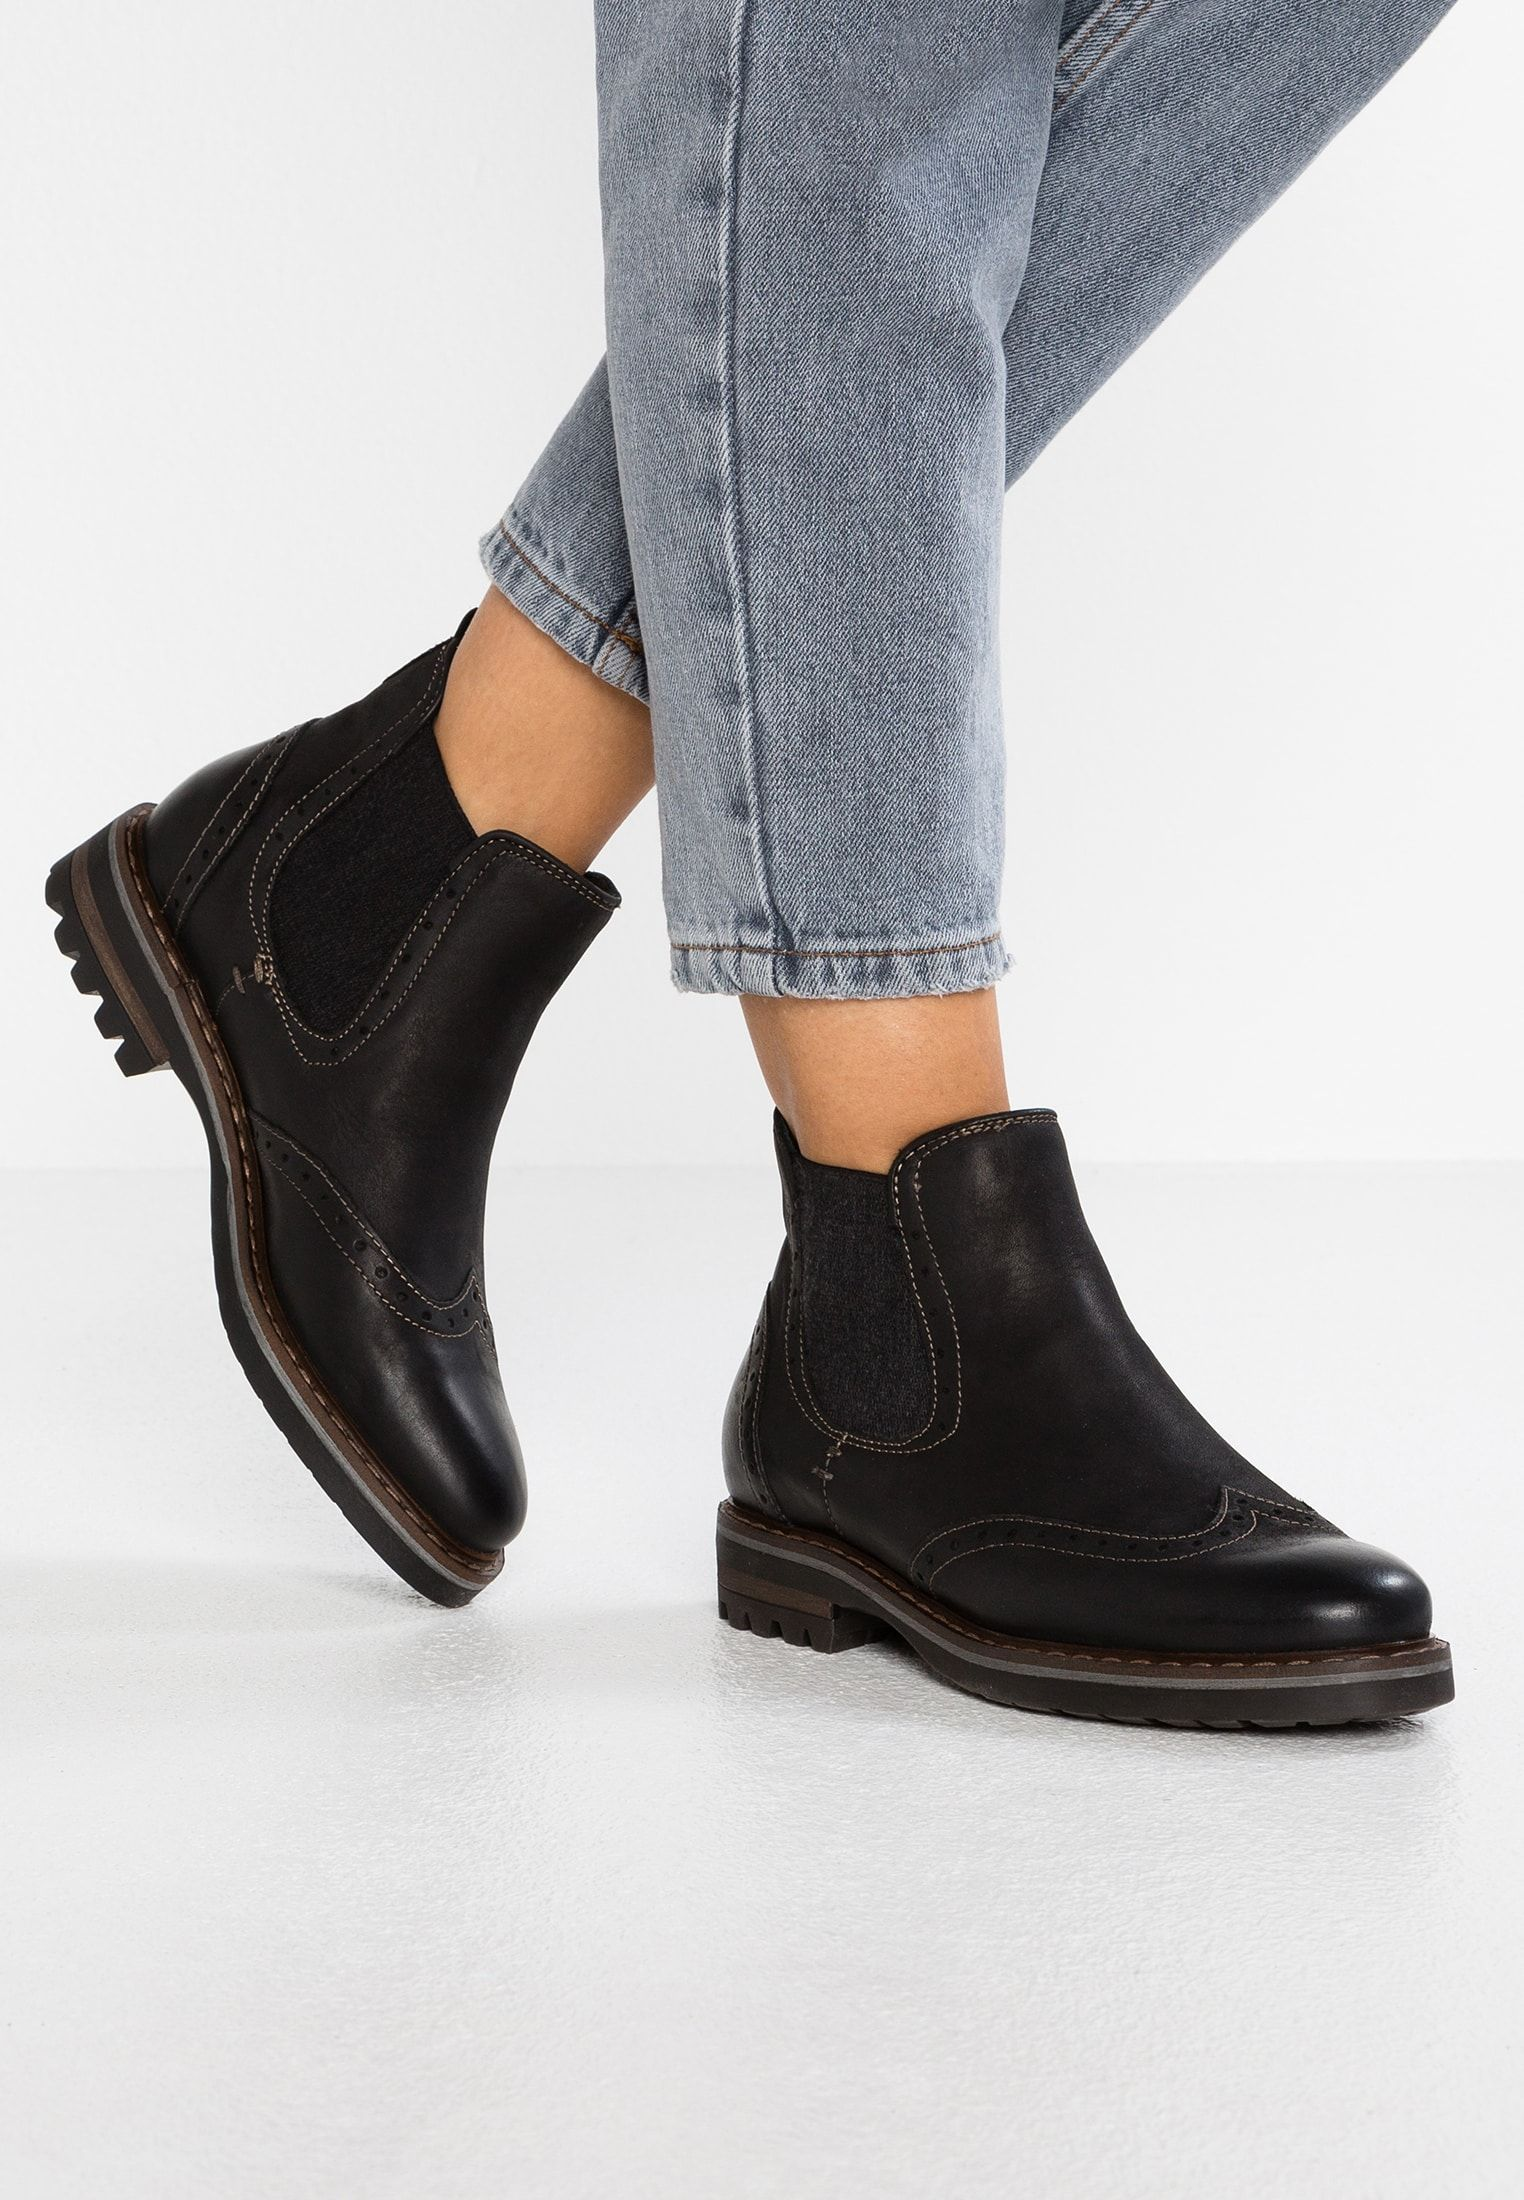 Pier One Ankle boots black Zalando.co.uk   Black ankle